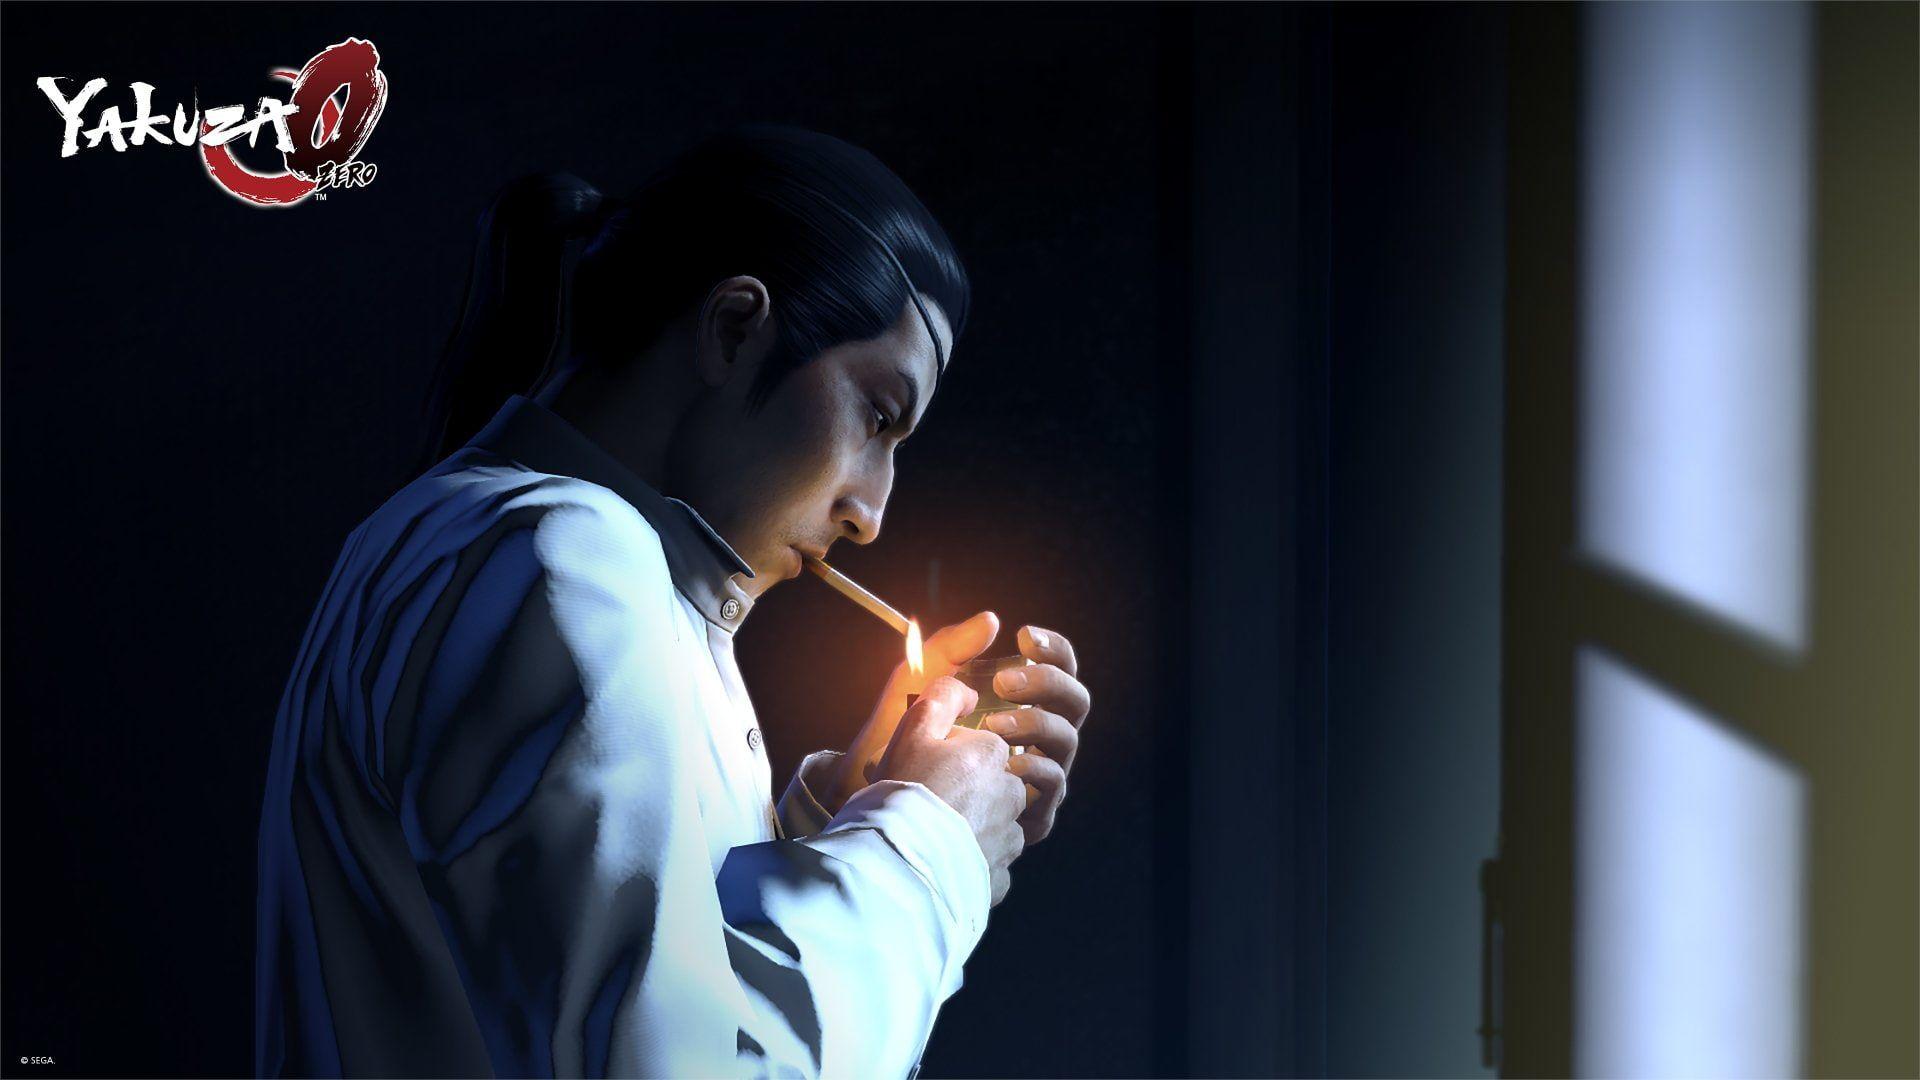 Video Game Yakuza 0 Goro Majima 1080p Wallpaper Hdwallpaper Desktop In 2020 Video Game King Of Fighters Destiny Video Game